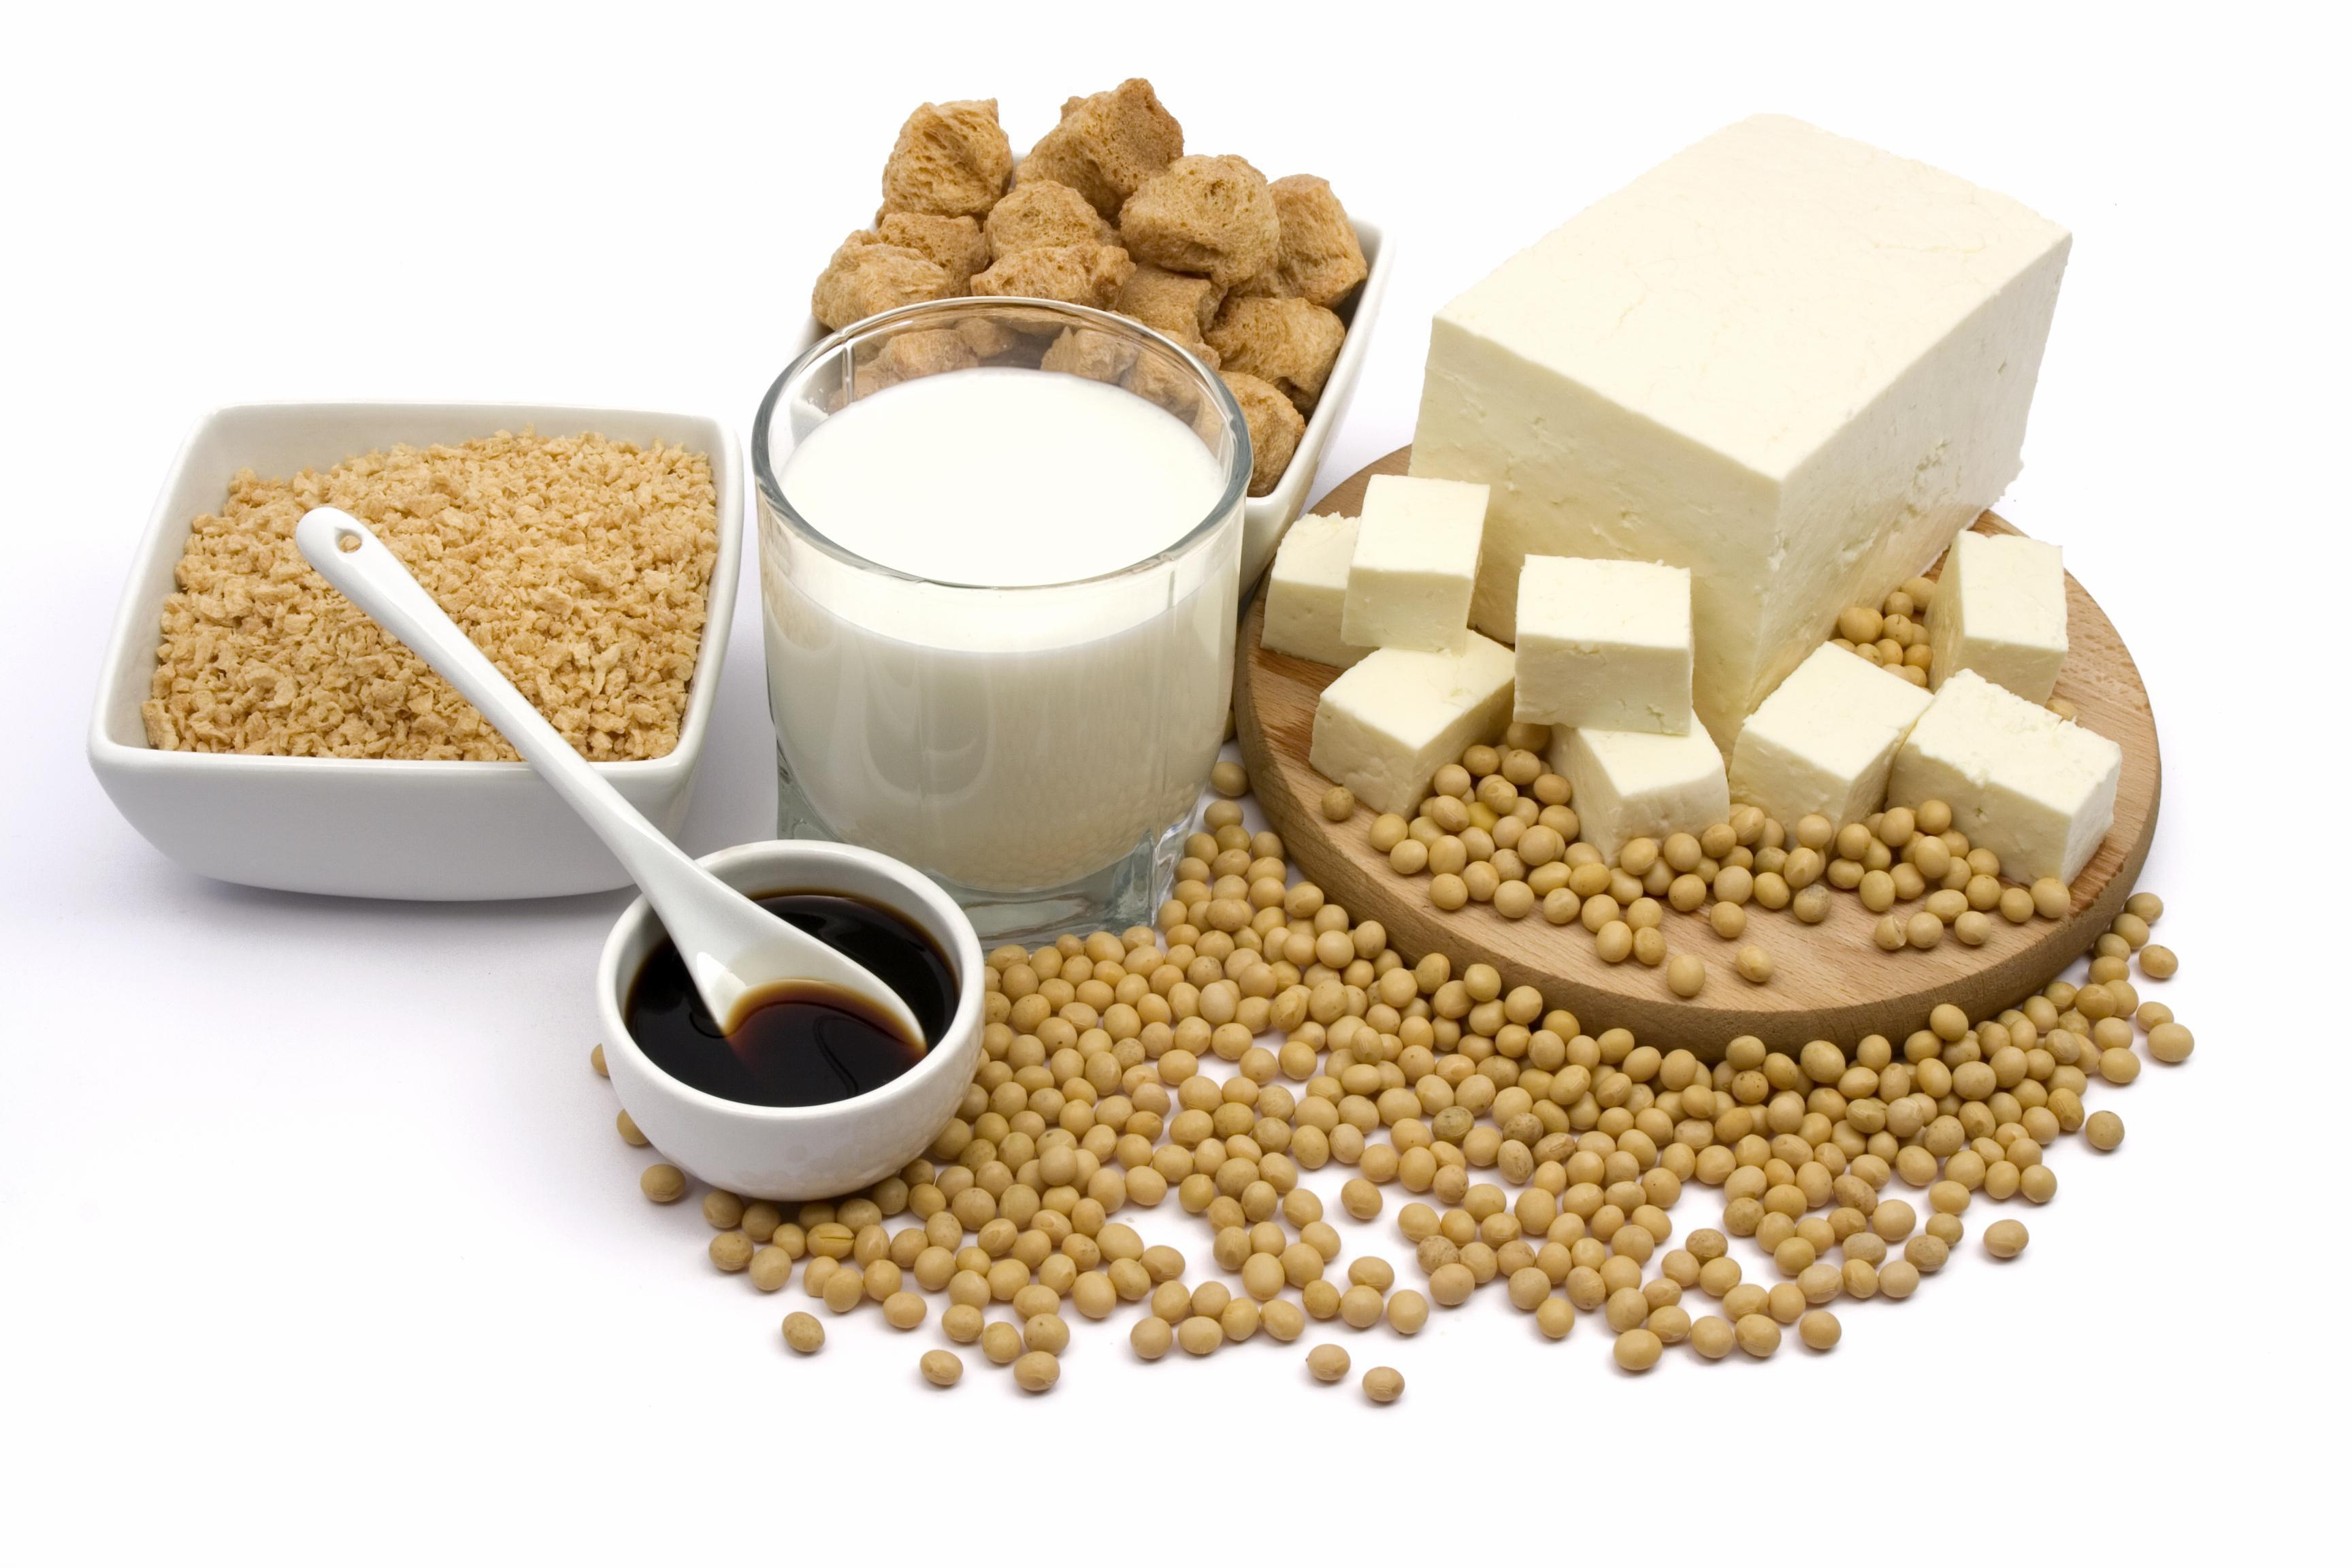 Dieta Vegetariana Rica em Proteínas